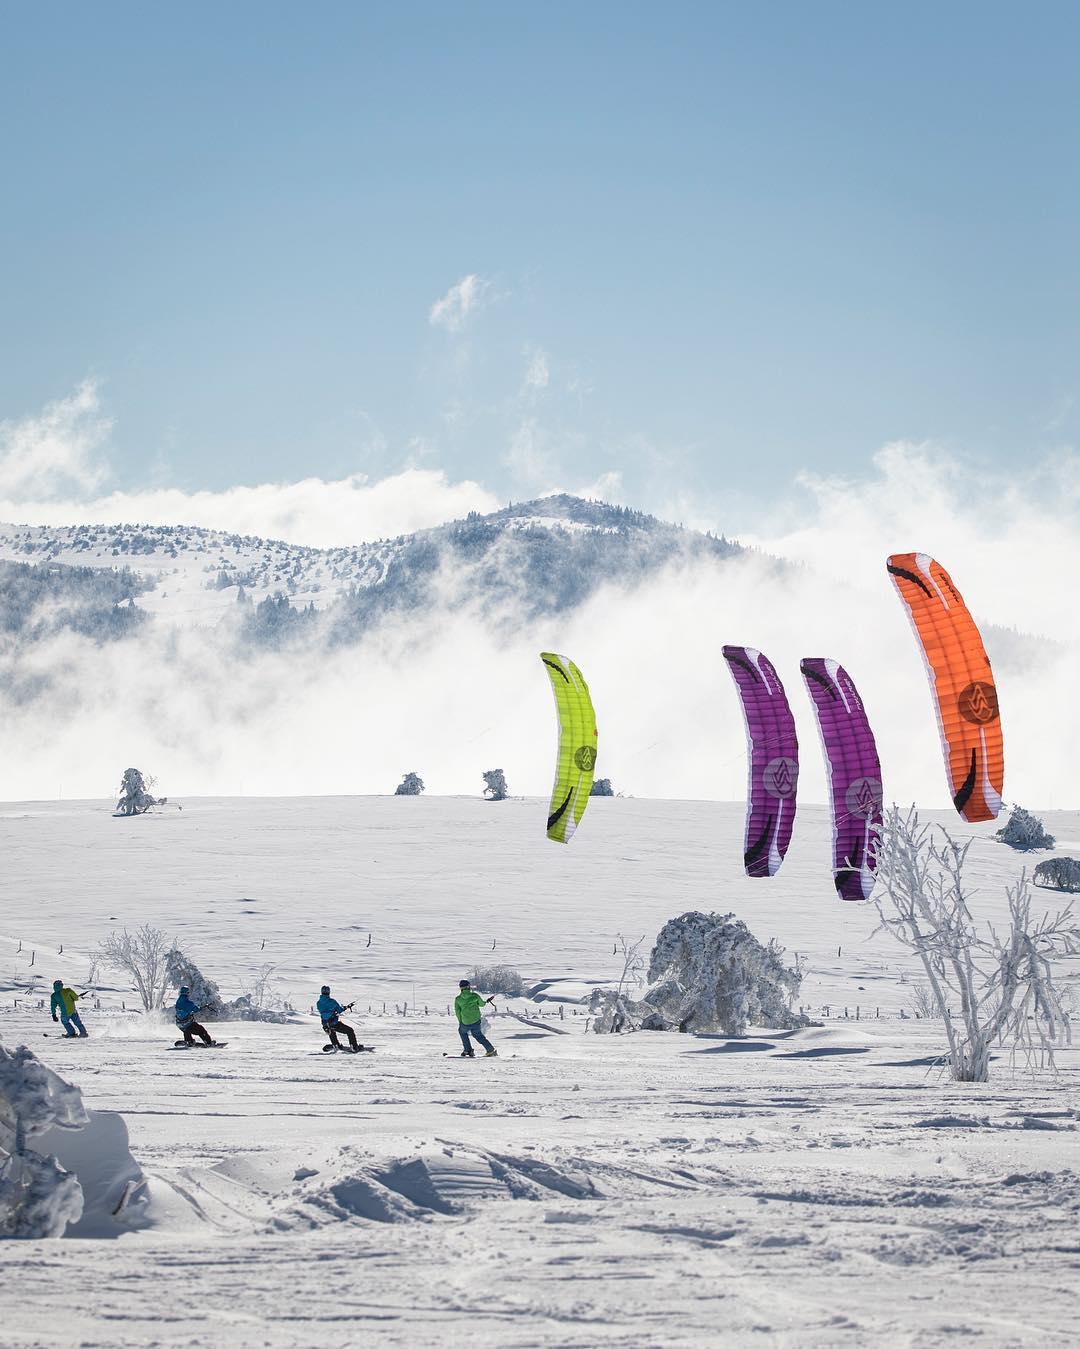 La storia dello snowkite - Credits: flysurferkiteboarding